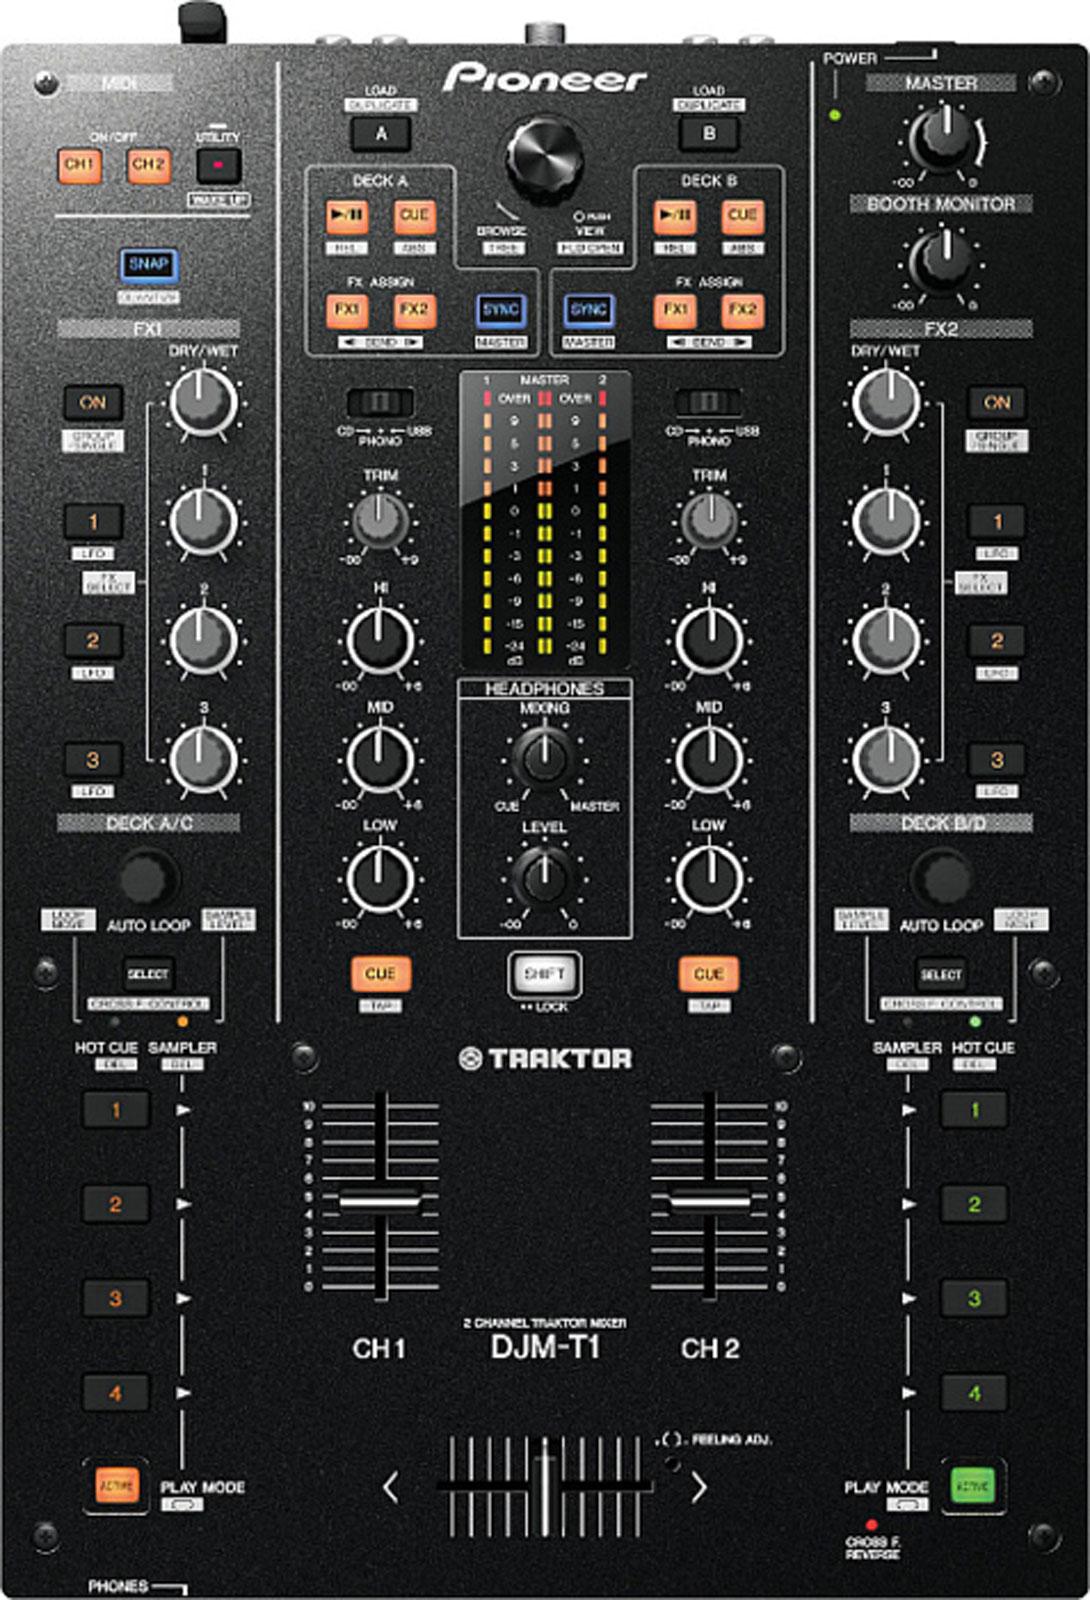 pioneer - djm-t1 high performance digital mixer (new) - jsfrance